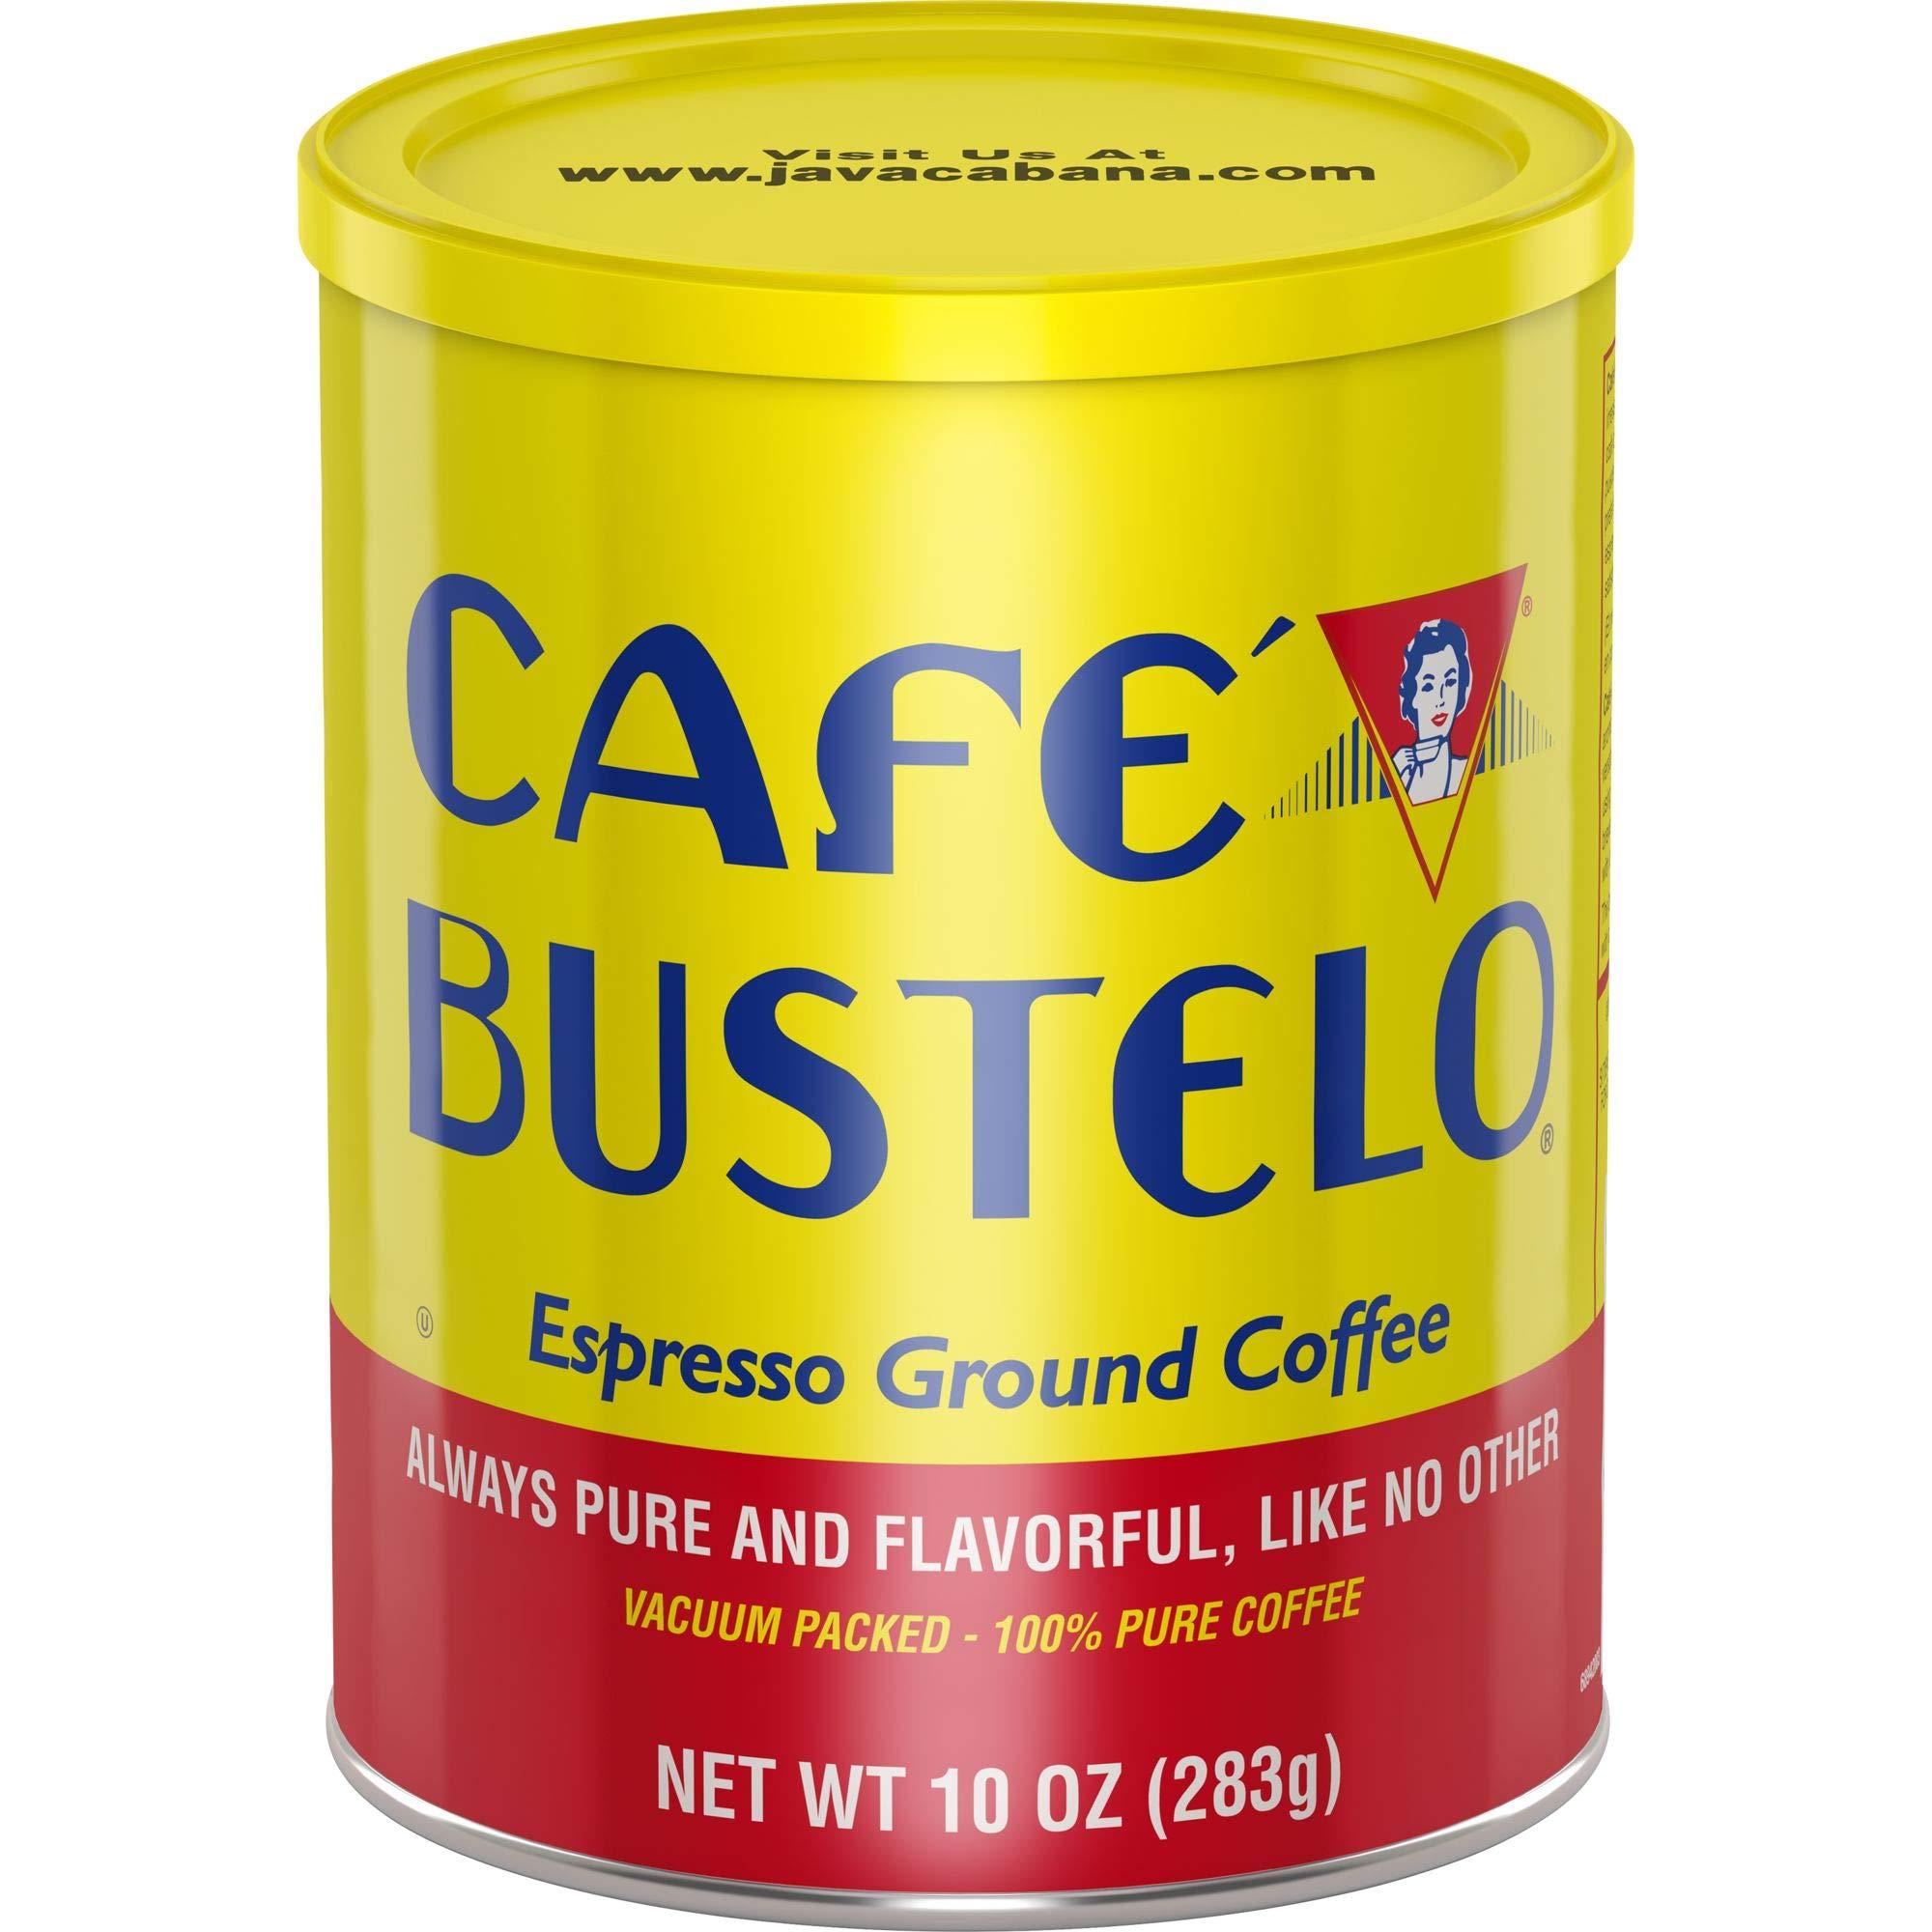 Café Bustelo Espresso Dark Roast Ground Coffee, 10 Ounces